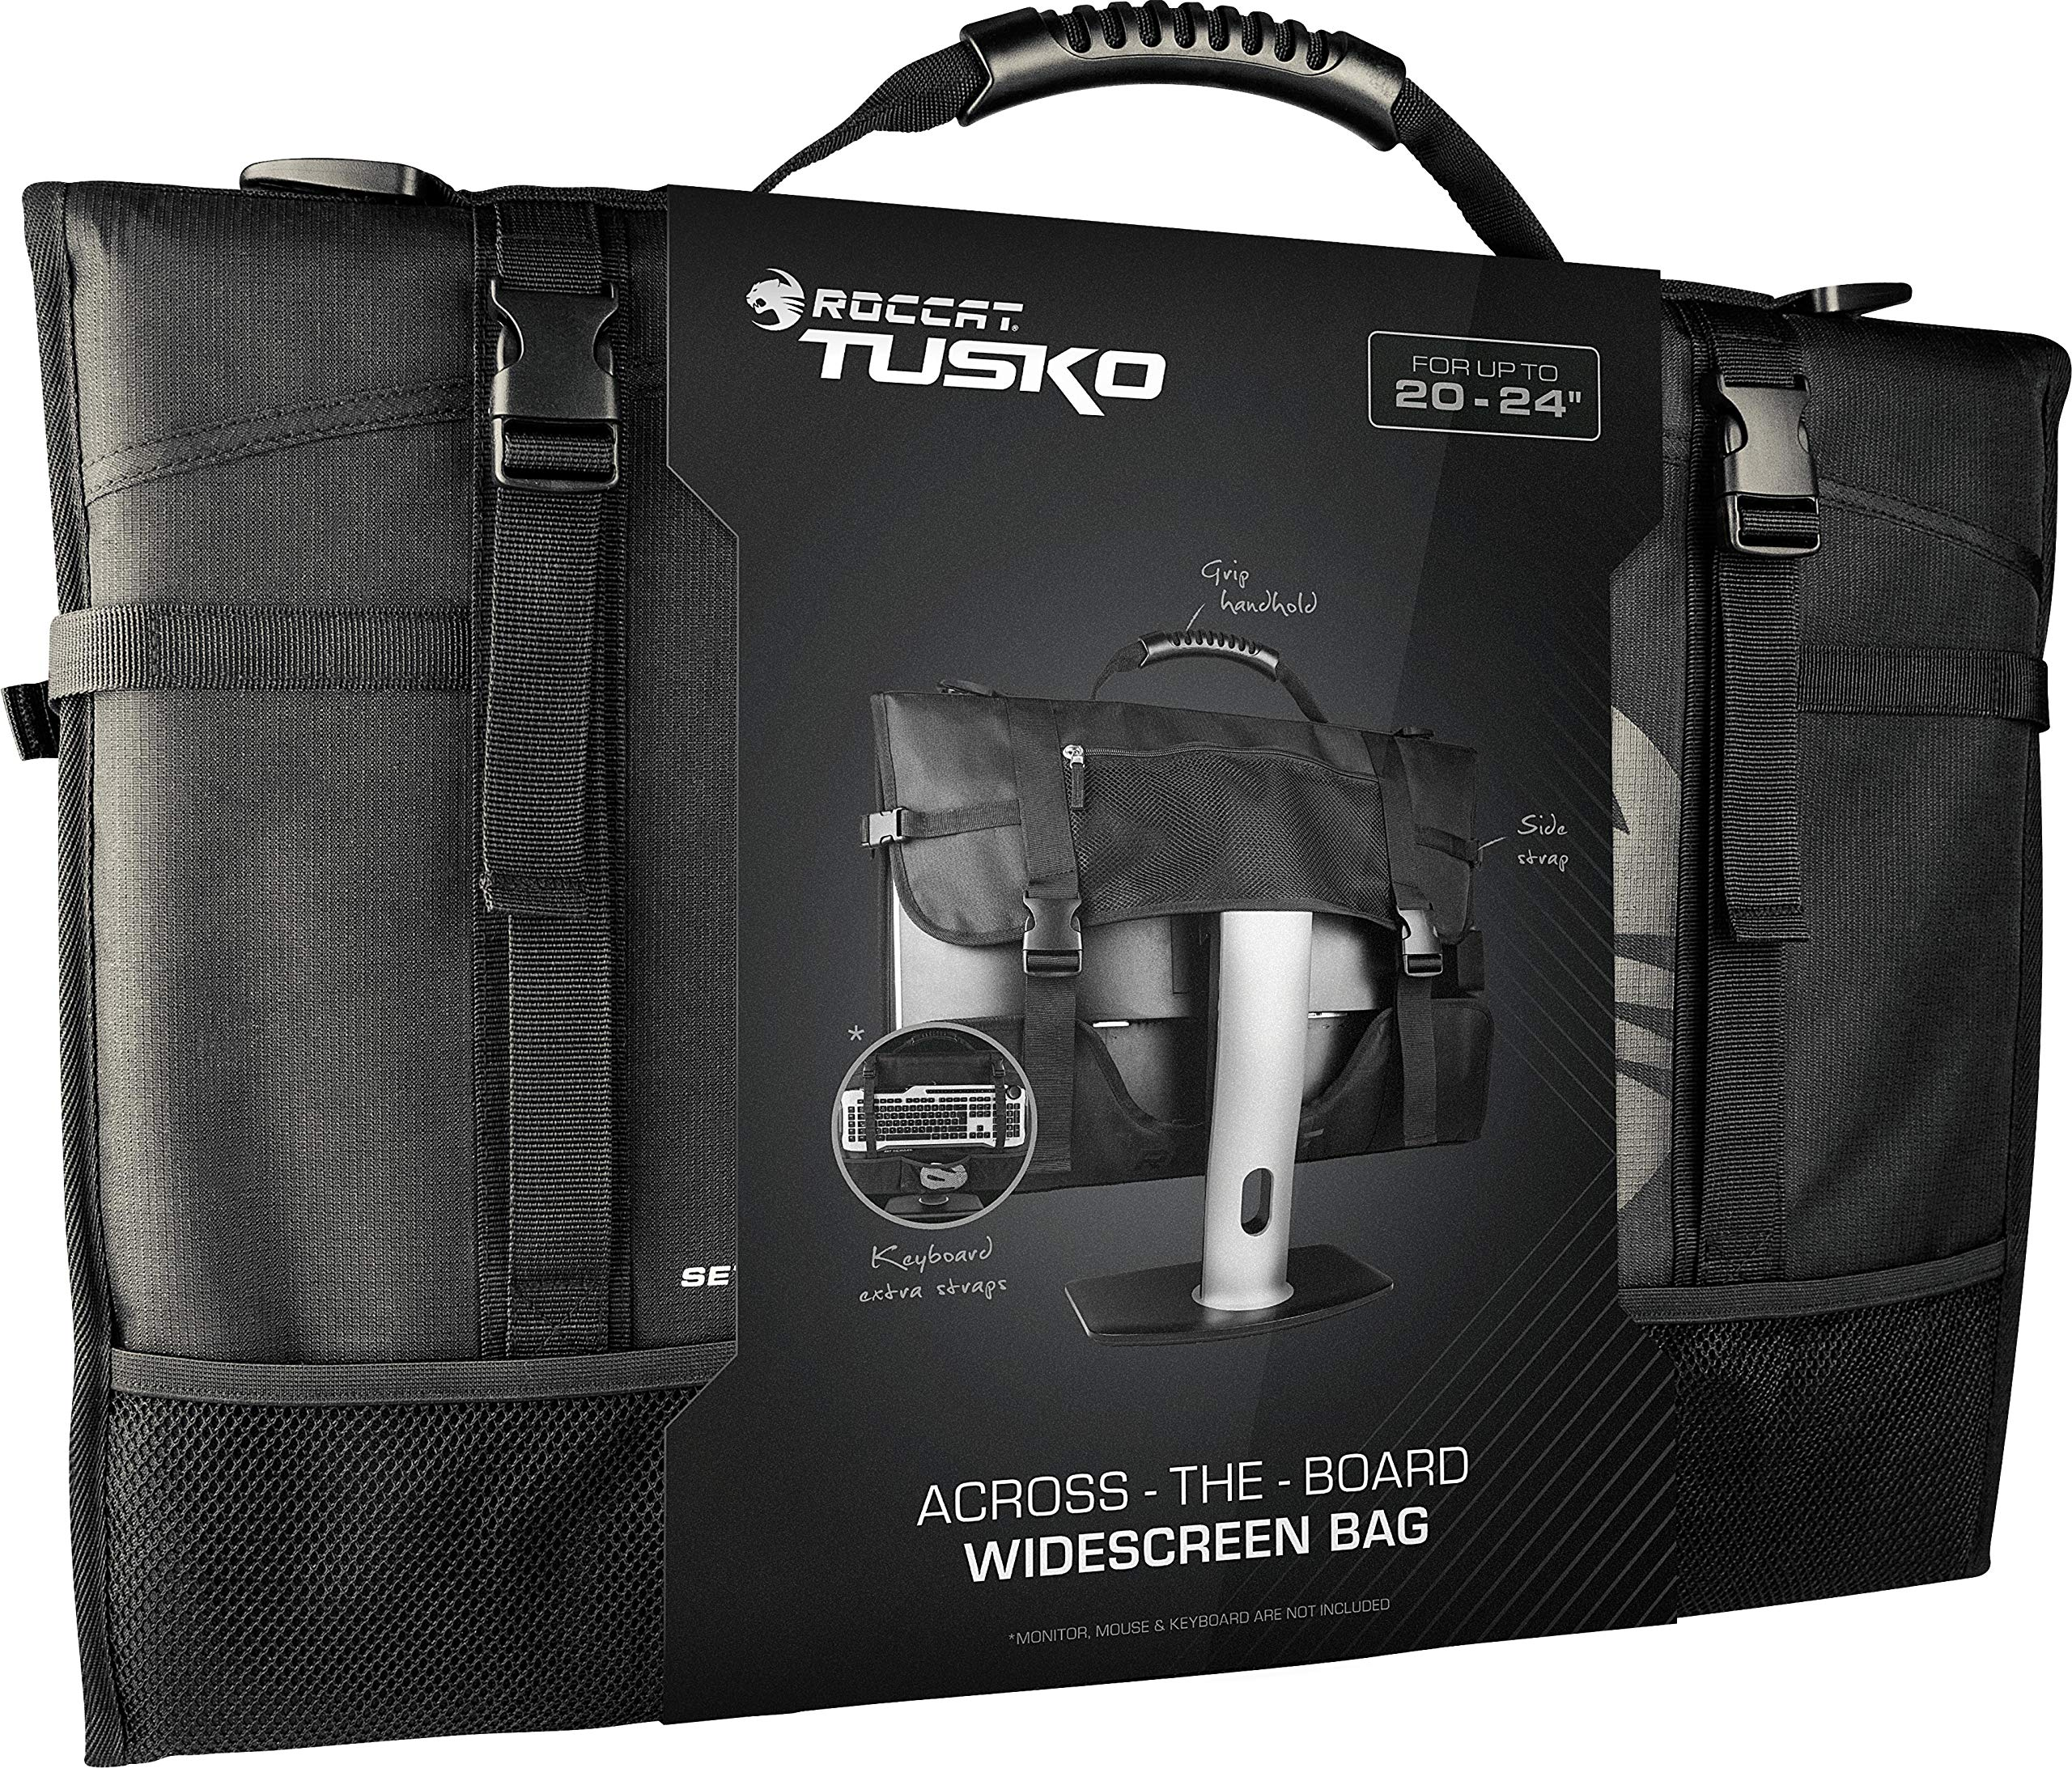 ROCCAT Latest Version Tusko Across-The-Board Flat Screen/Widescreen Bag, Black by ROCCAT (Image #2)